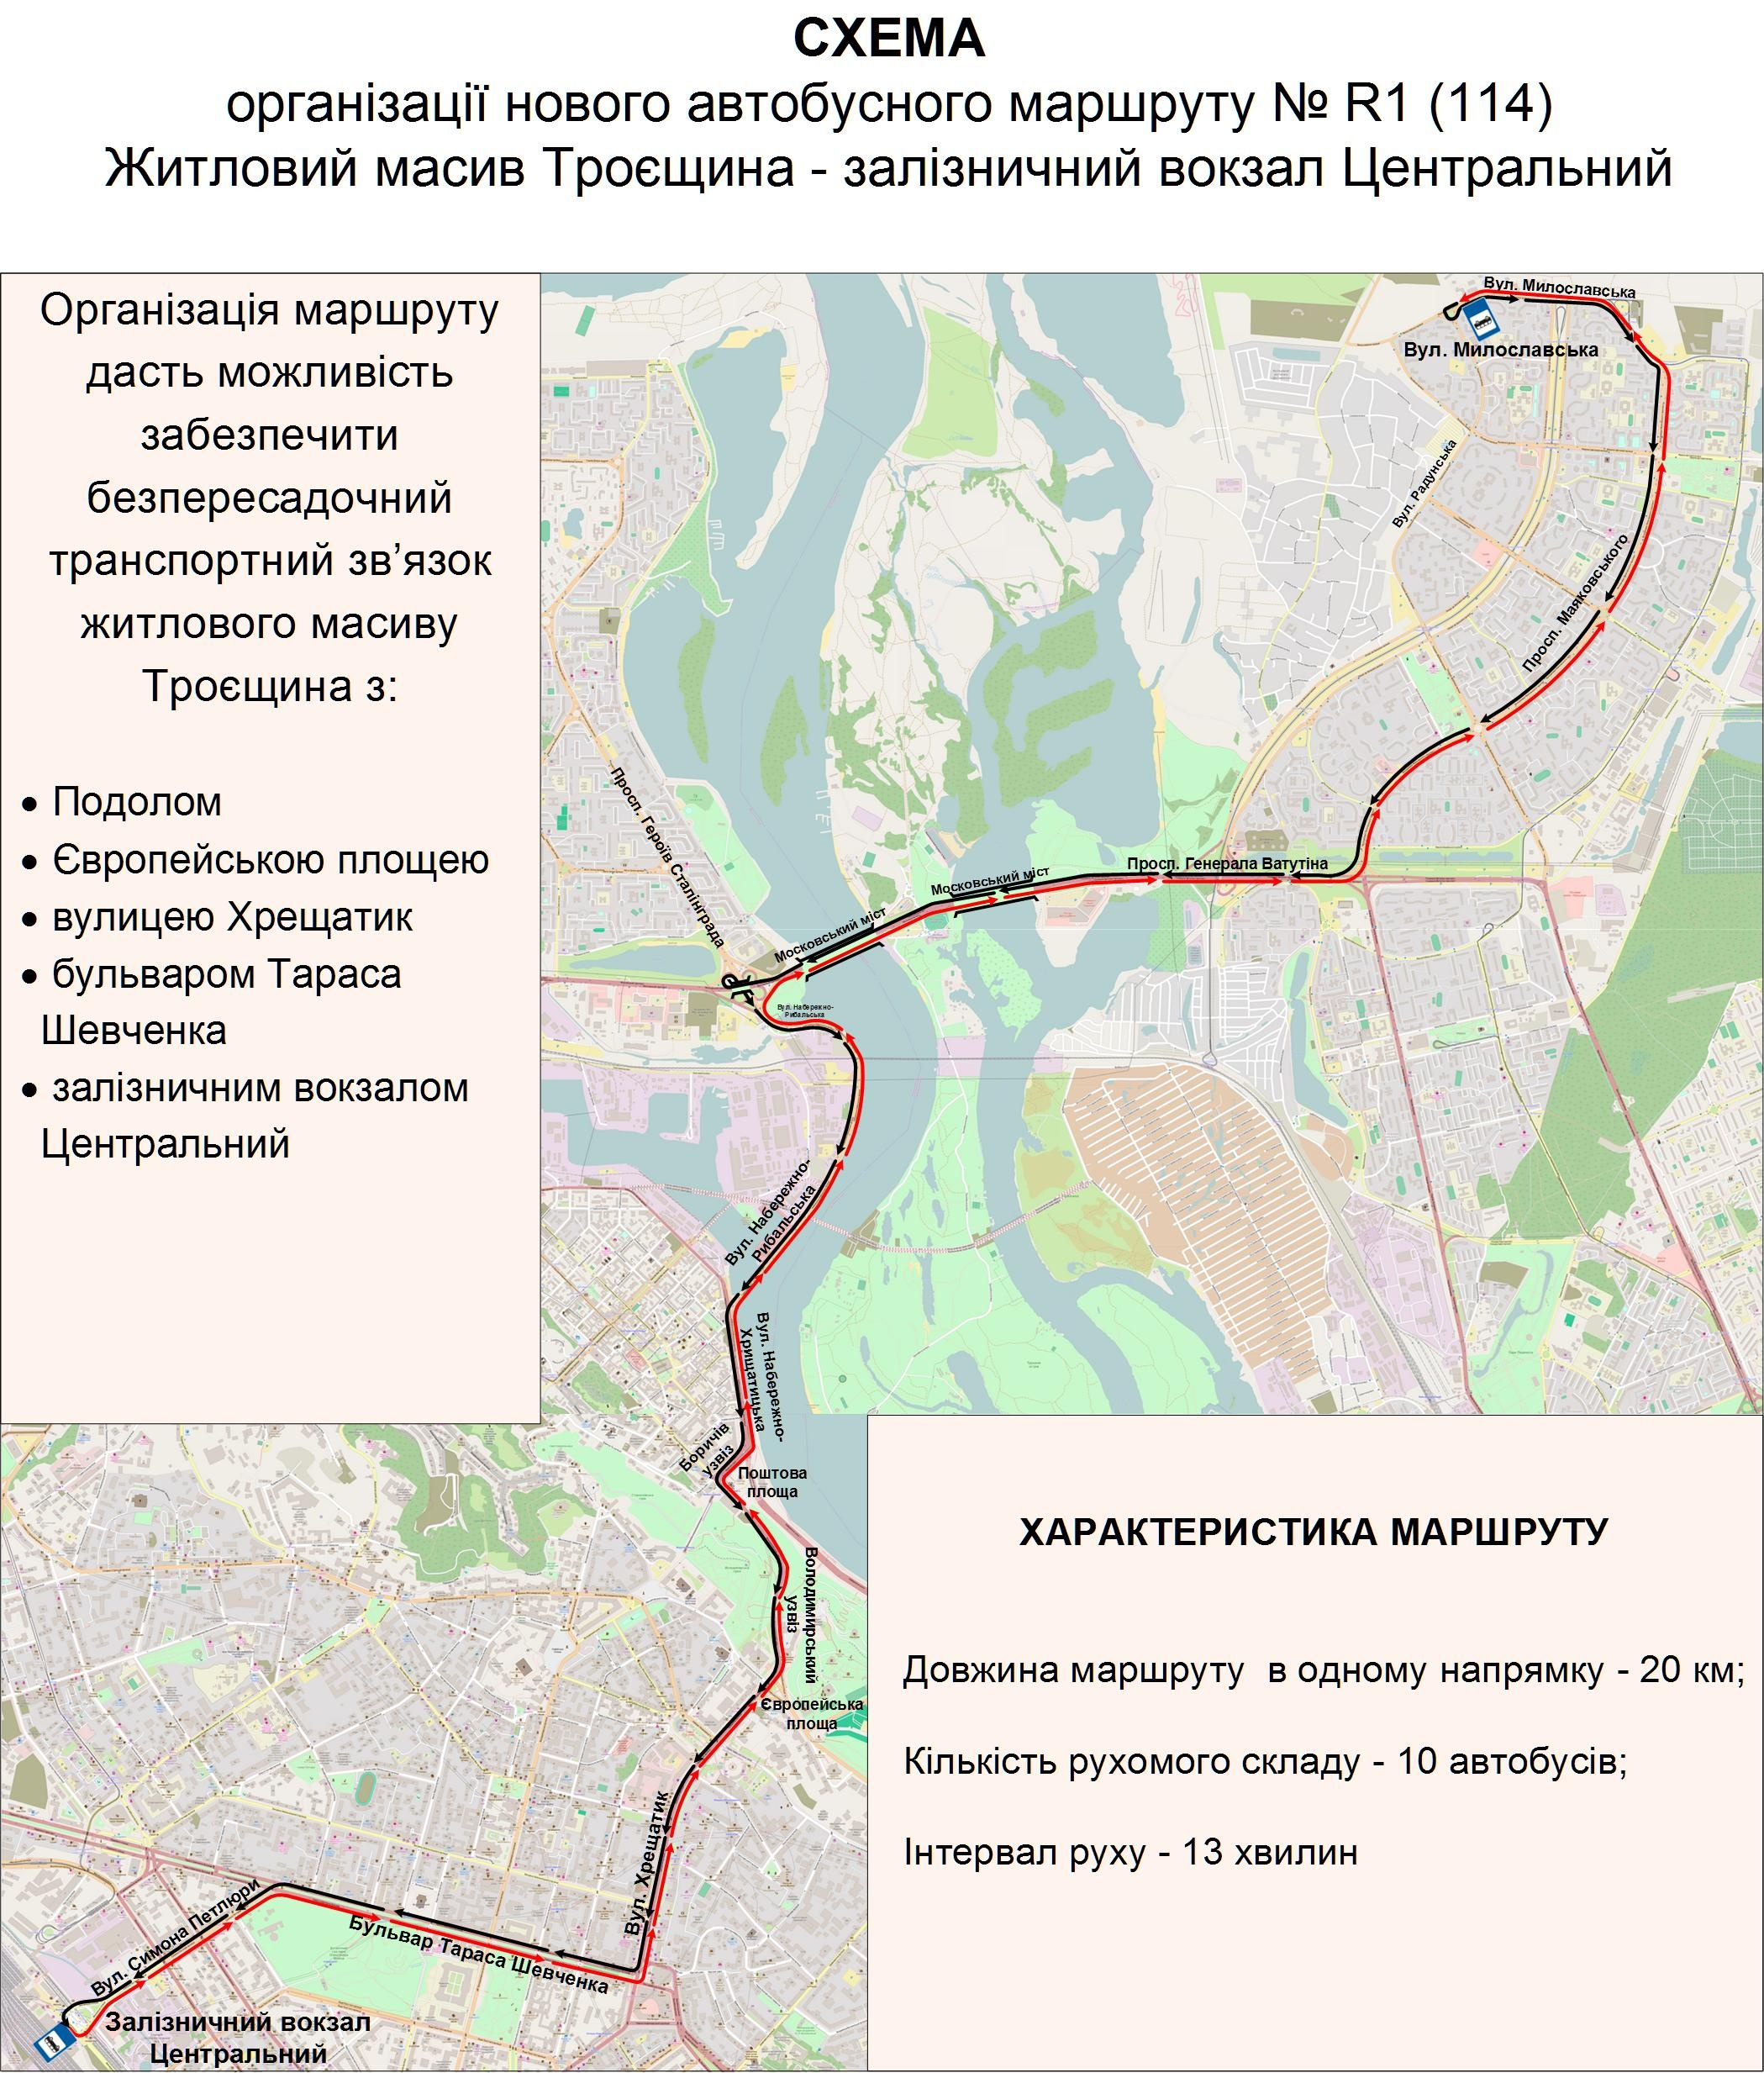 Схема проезда по киев